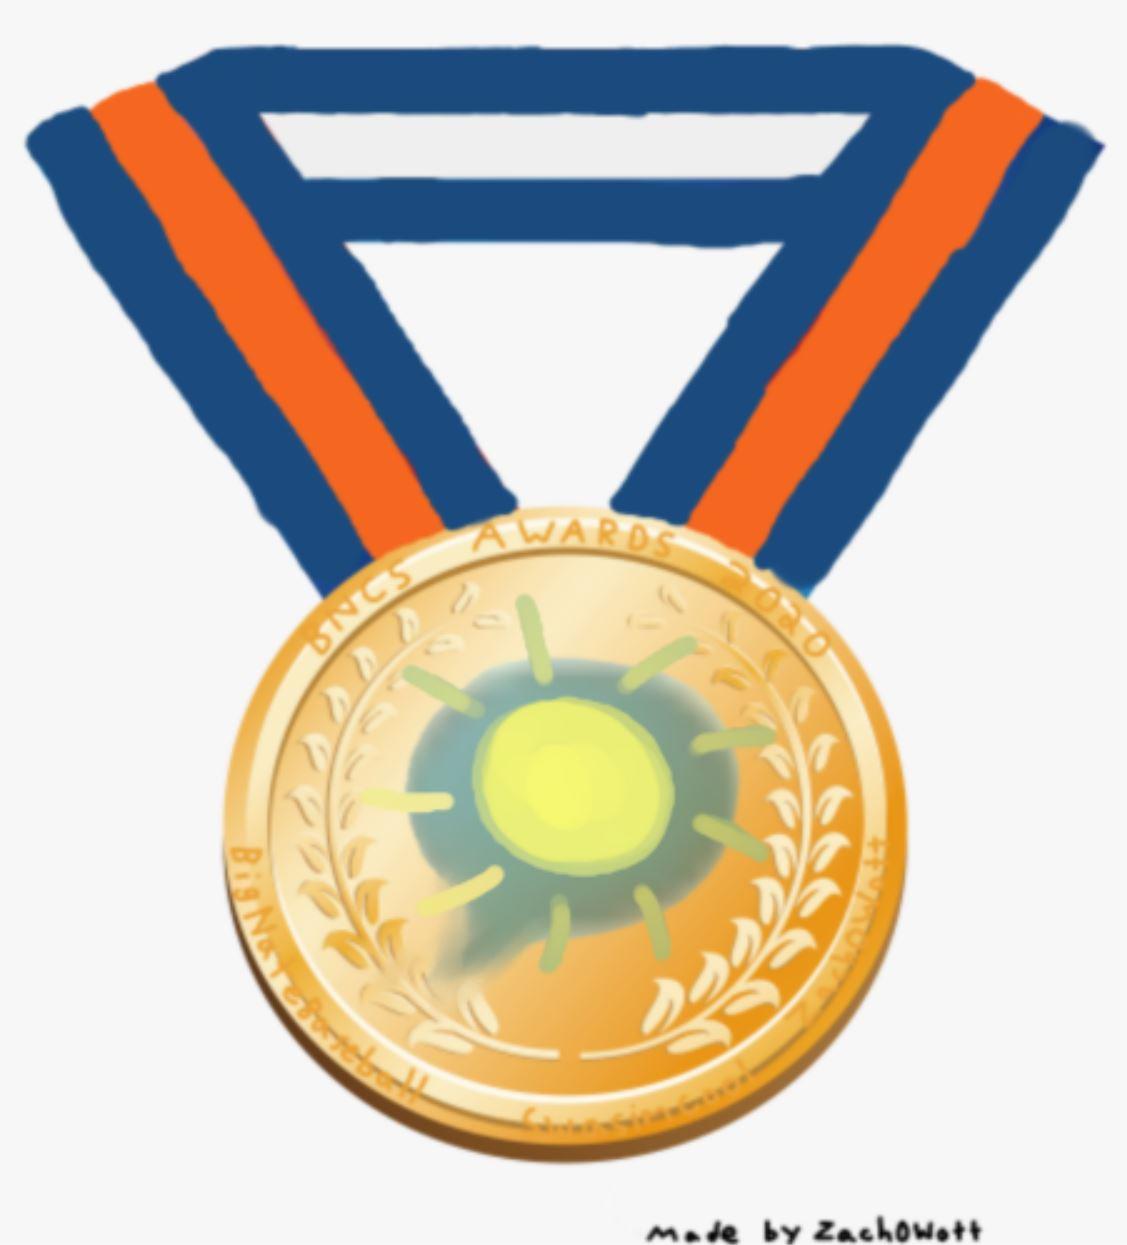 2020 BNCS Awards Results (Summer Edition)